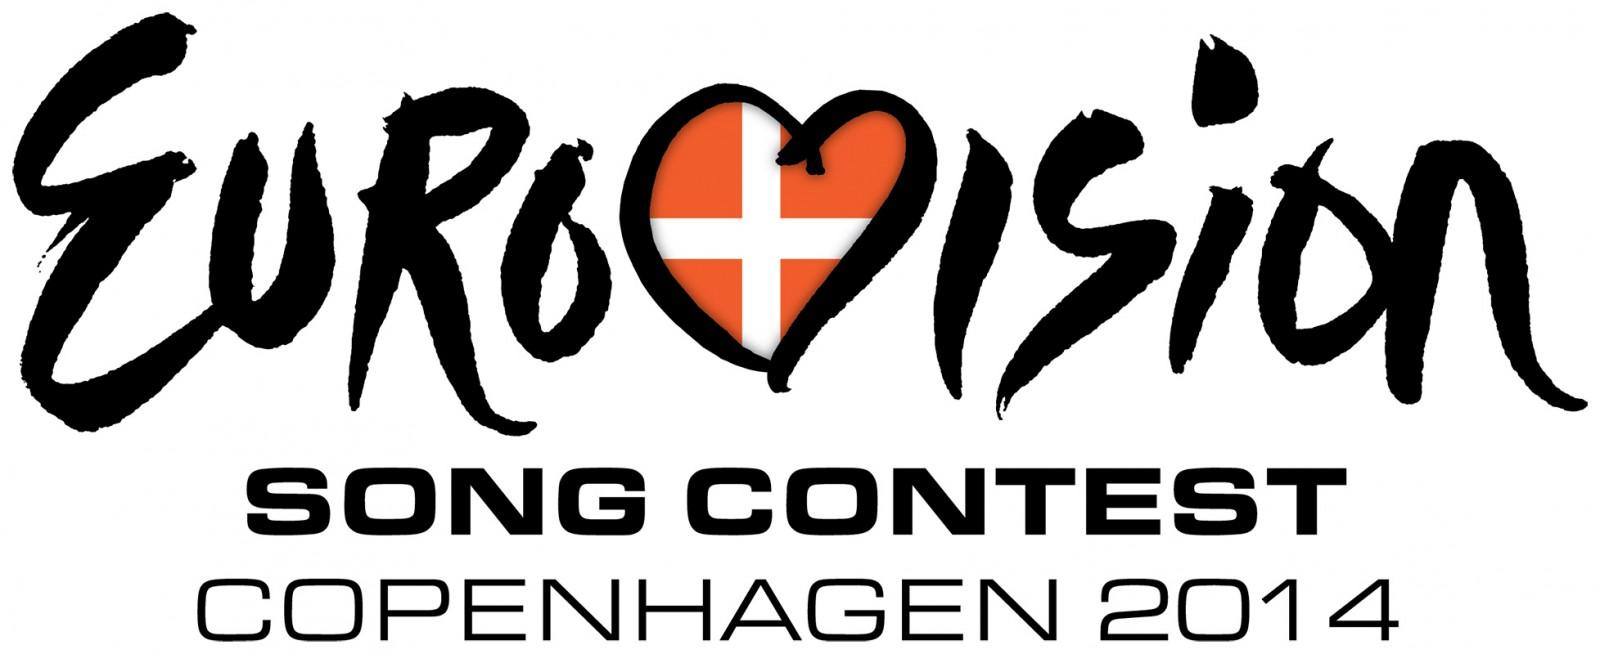 ESC2014_generic_logo